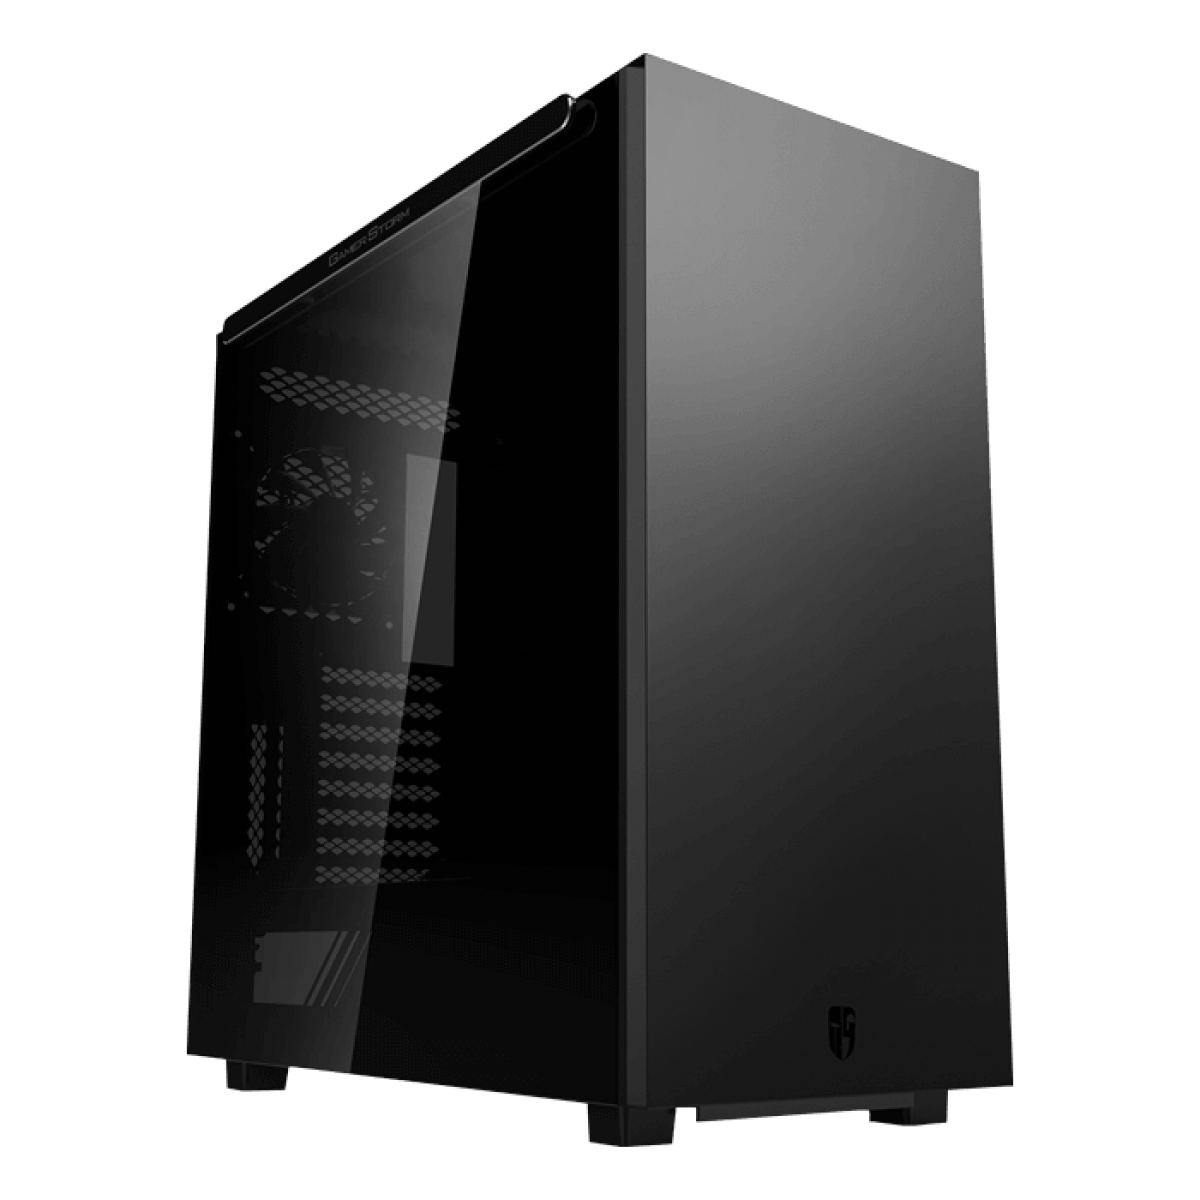 Gabinete Gamer DeepCool, Macube 550, Full Tower, Vidro Temperado, Black, Sem Fonte, Com 1 Fan, GS-ATX-MACUBE550-BKG0P